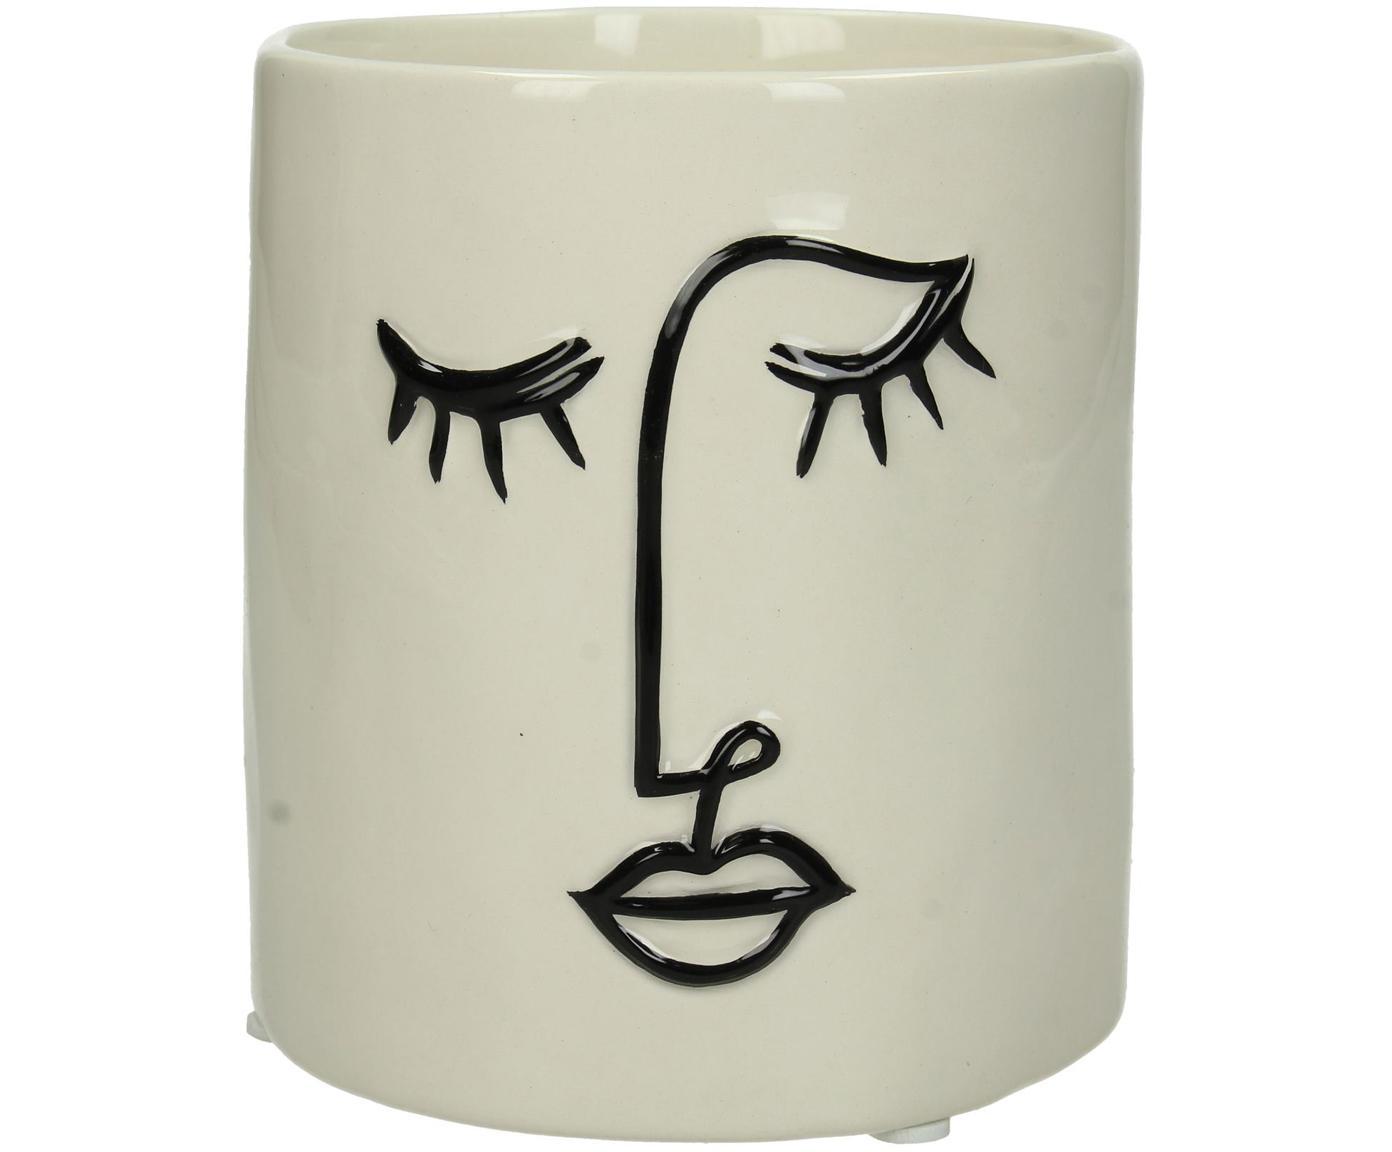 Portavaso Face, Terracotta, Bianco latteo, nero, Ø 12 x Alt. 13 cm